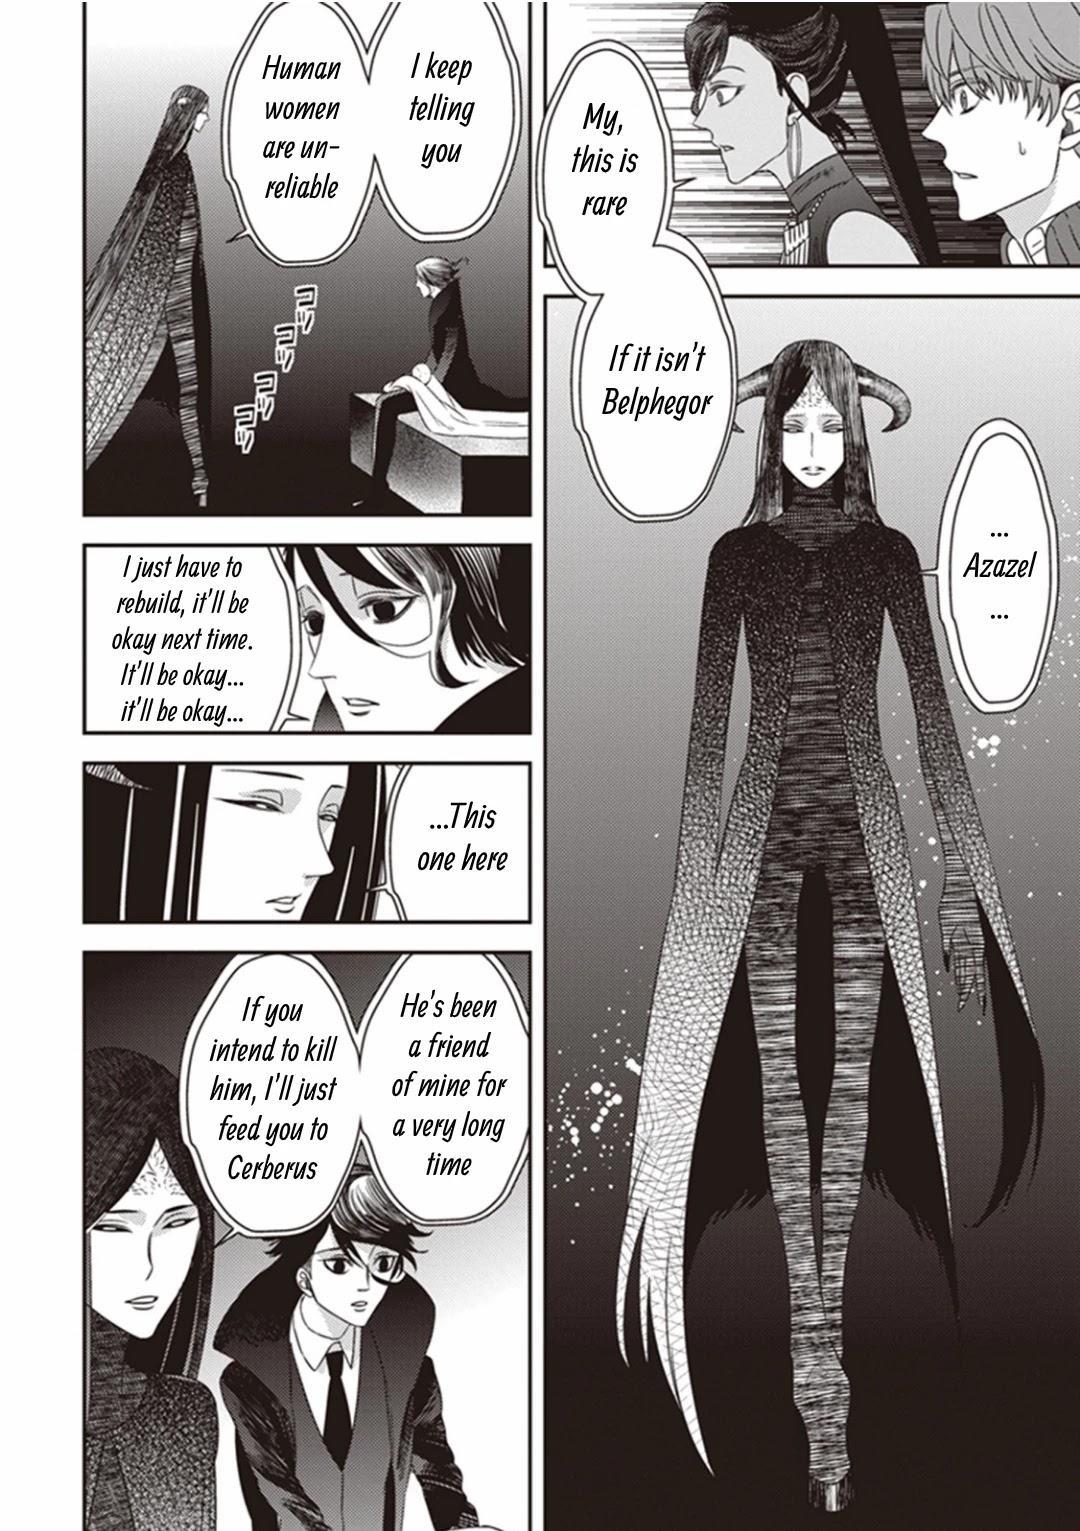 Midnight Occult Civil Servants Chapter 11.2: Demon And Sense Of Loss (Part 4) page 15 - Mangakakalots.com